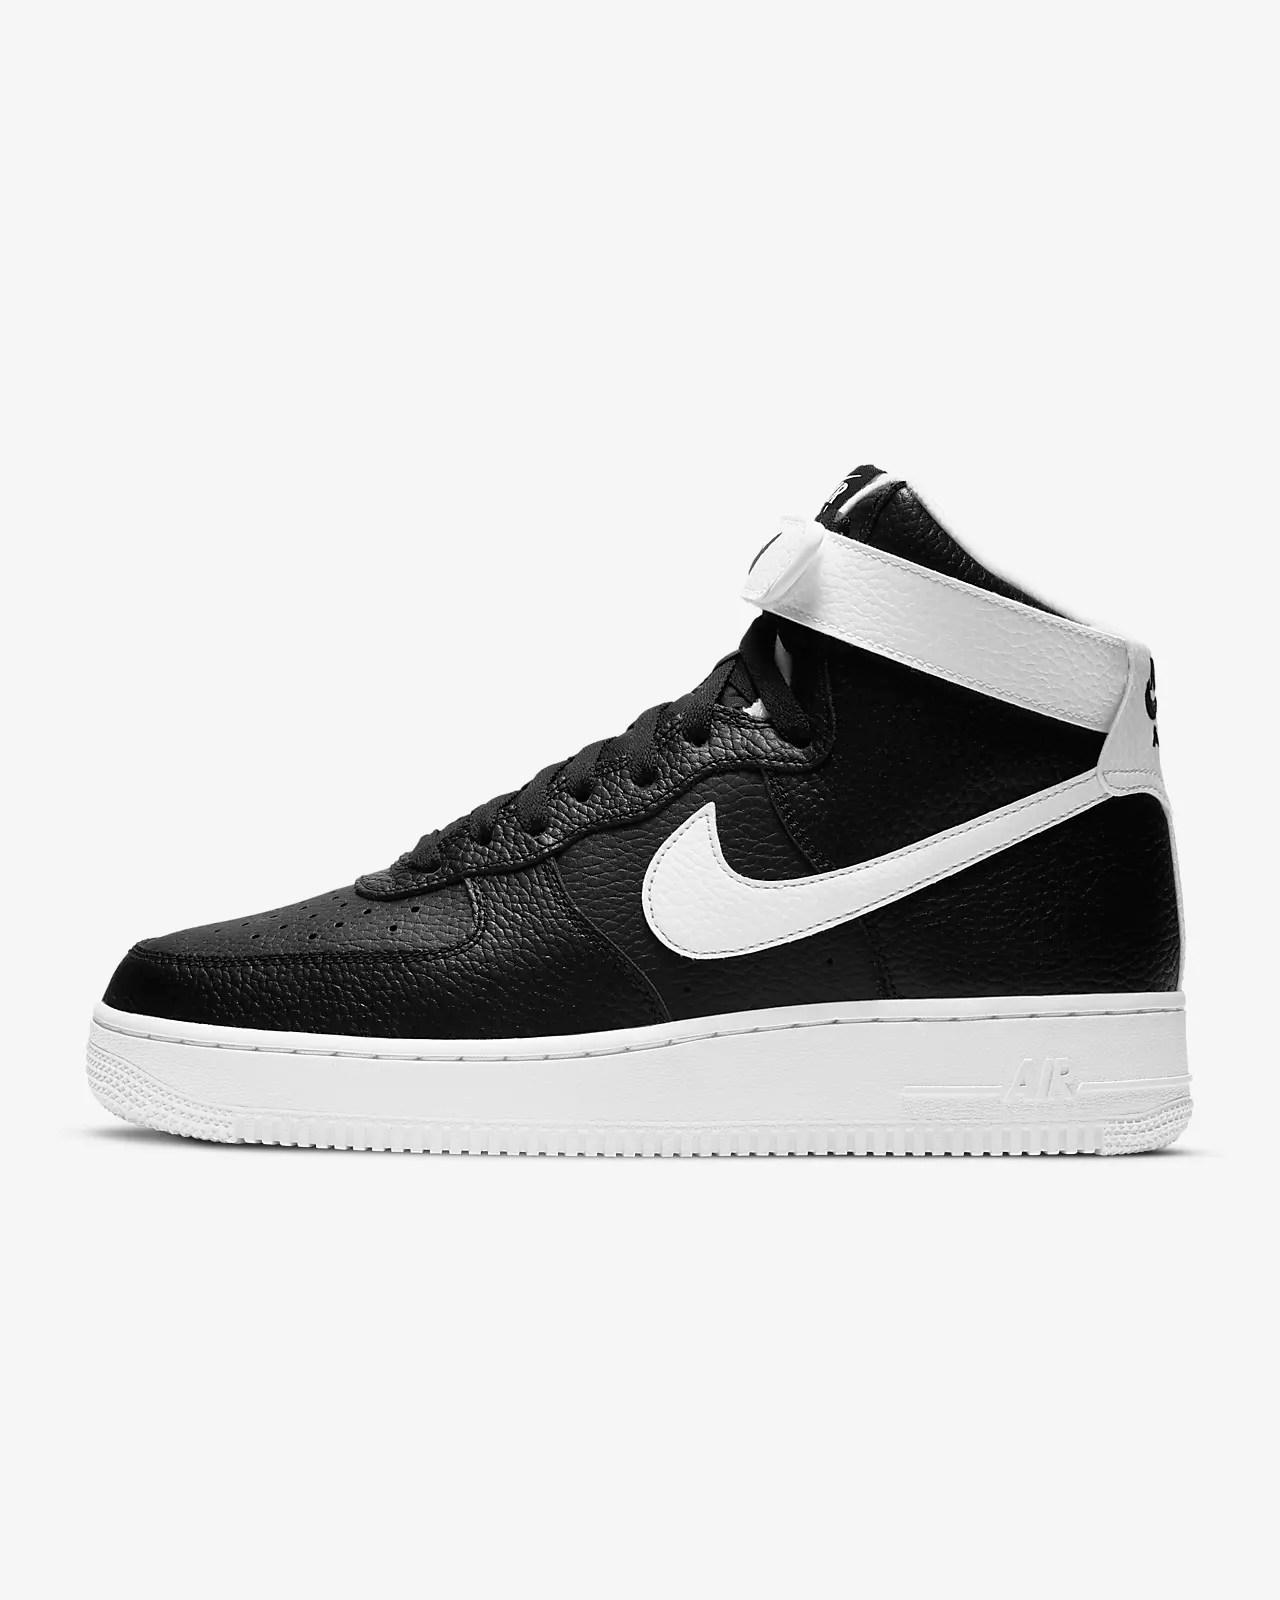 Nike Air Force 1 '07 High 'Black / White'